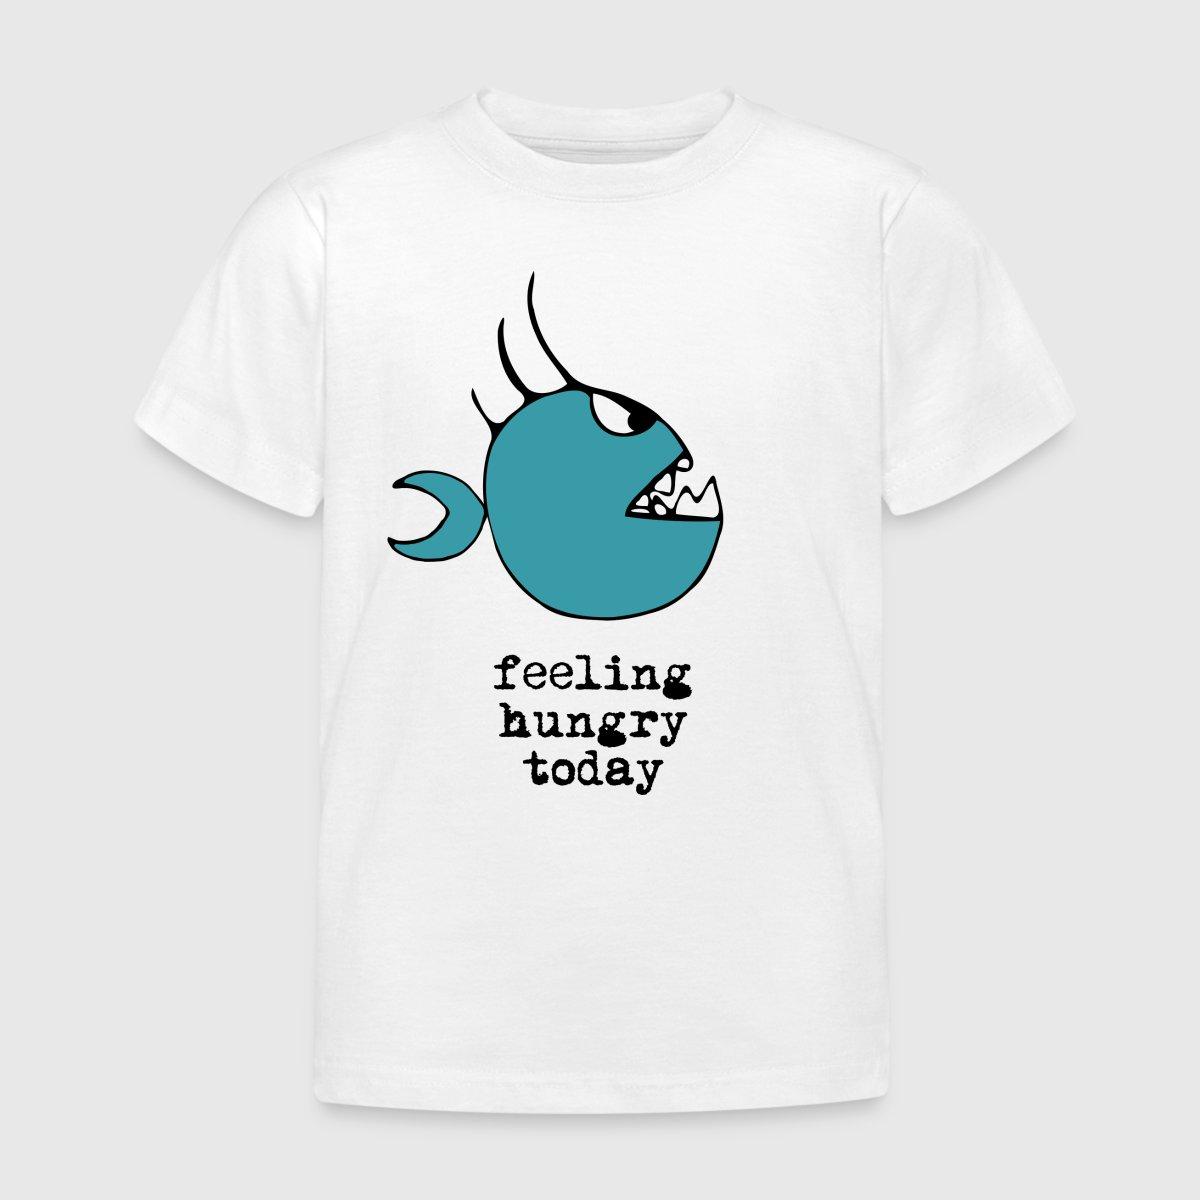 Dibujo hambriento piranha por Tbee | Spreadshirt